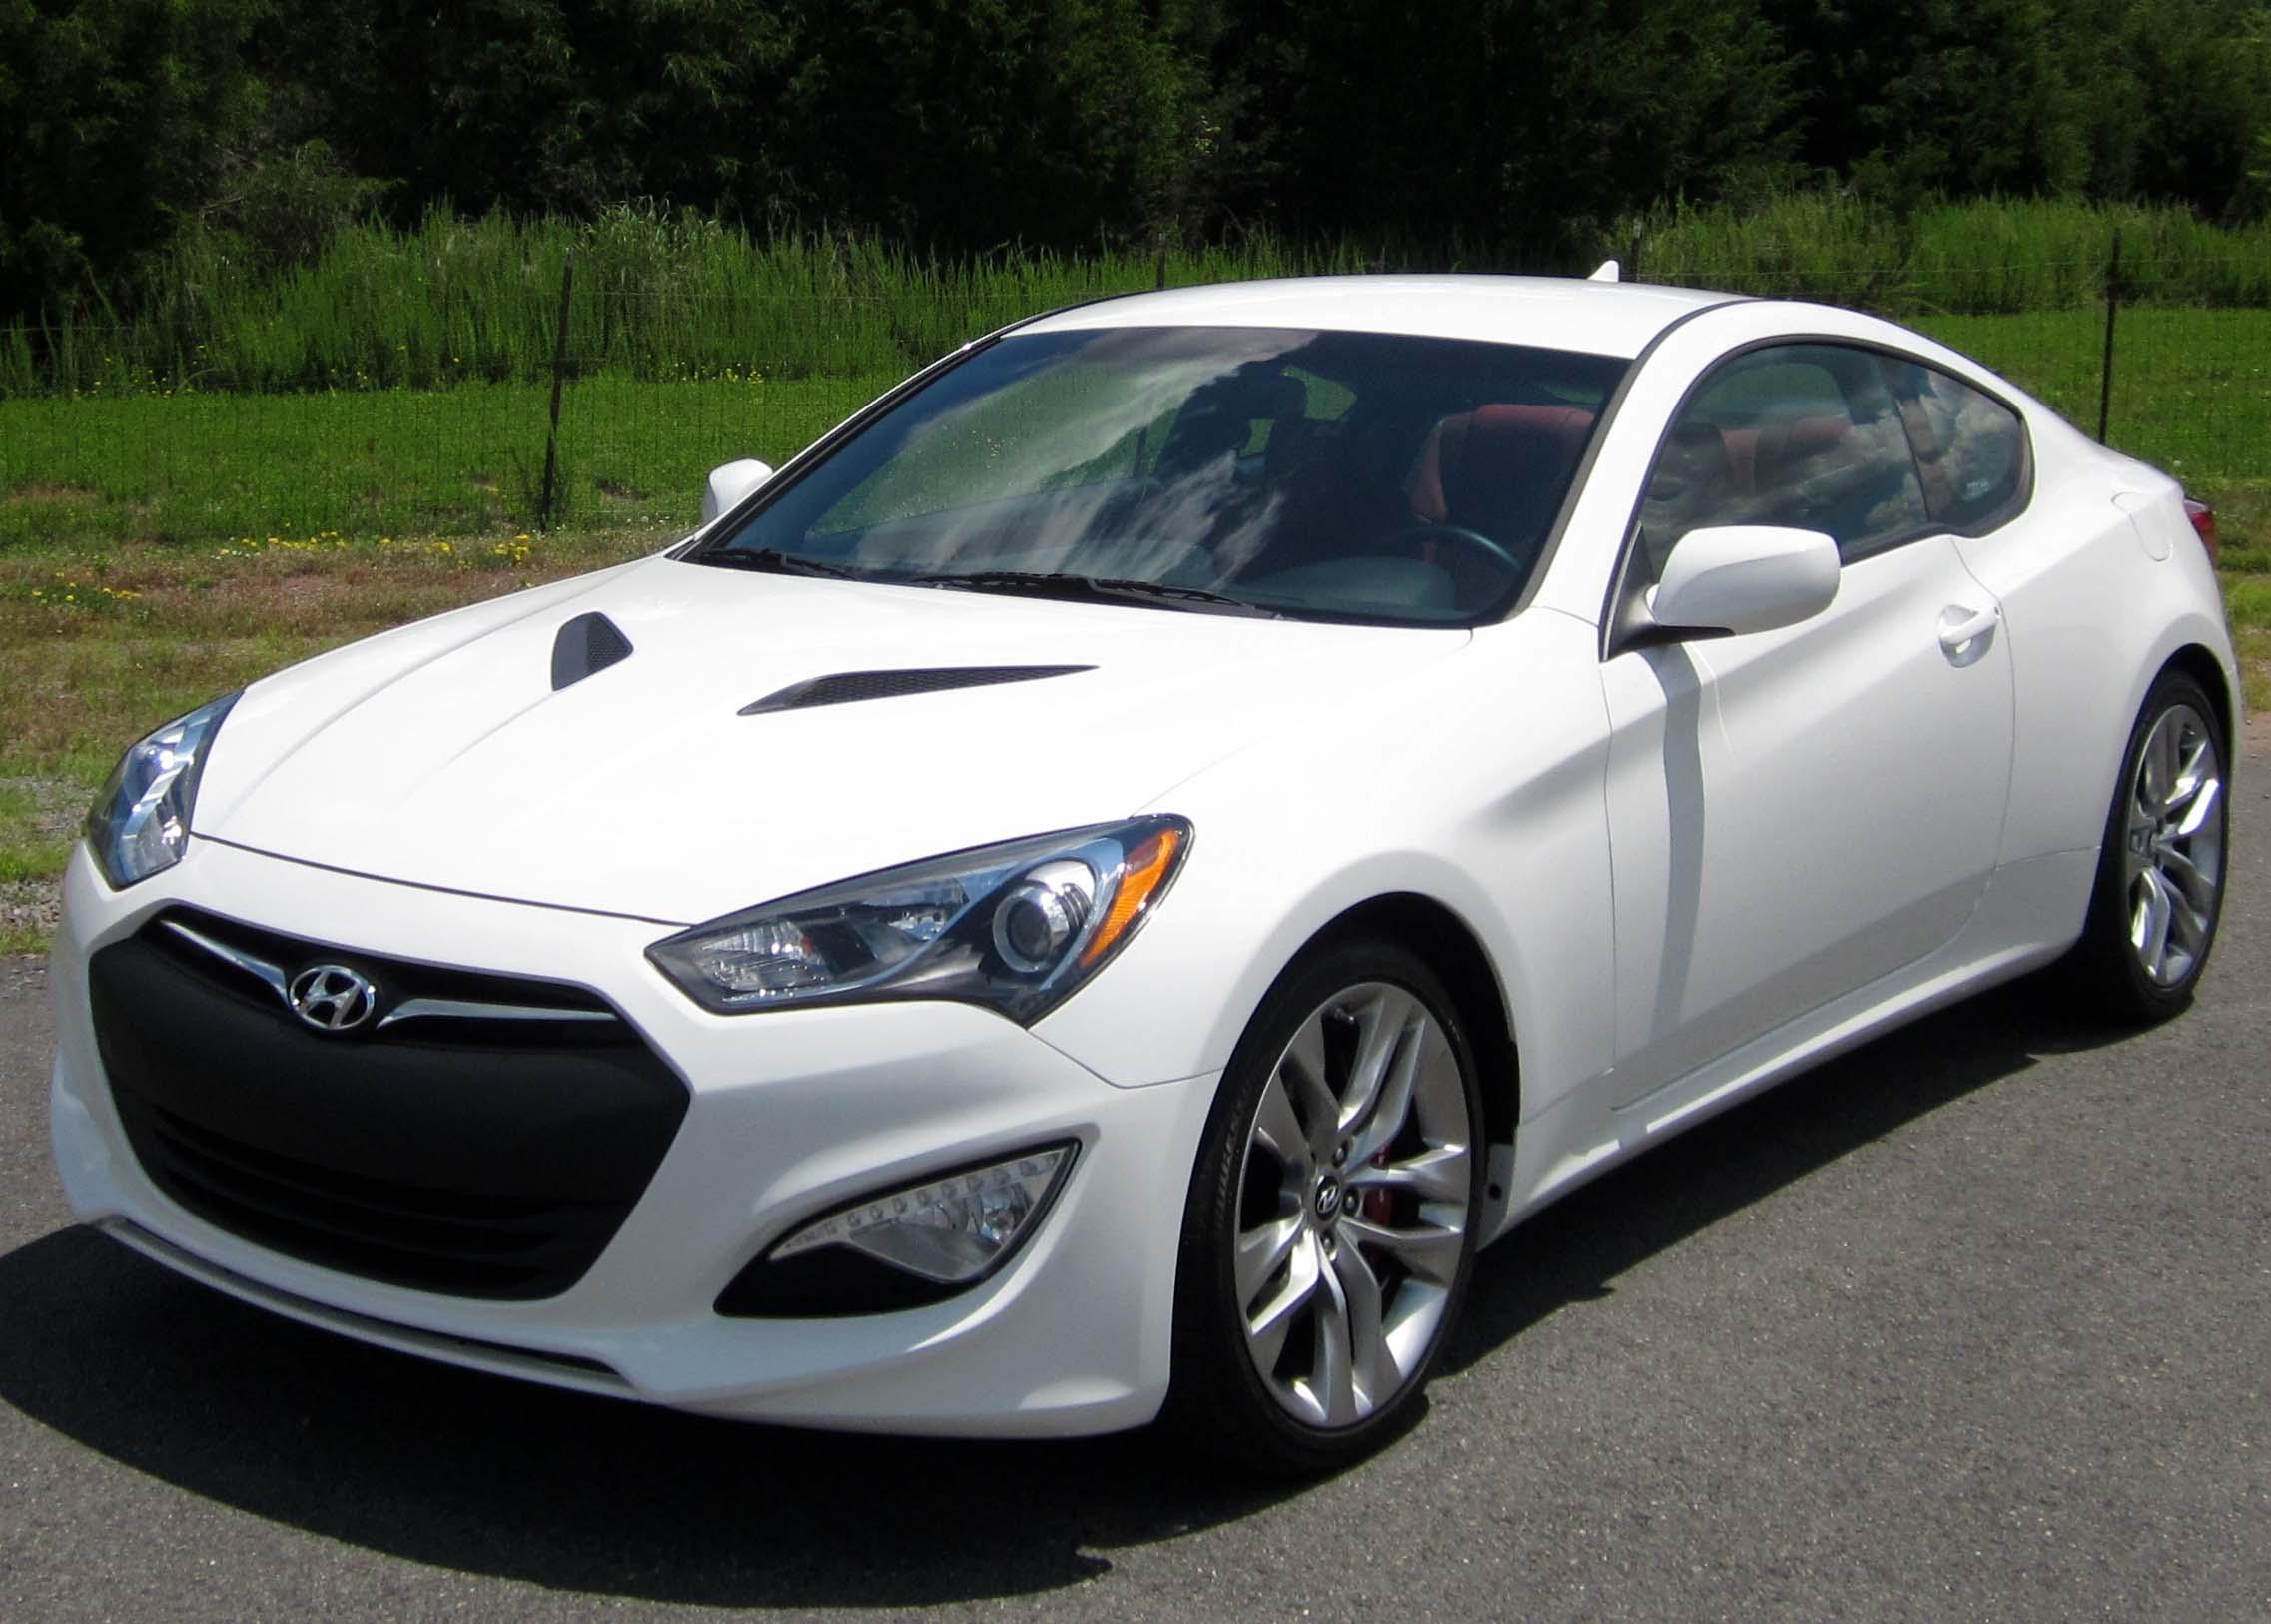 Superior Hyundai Genesis